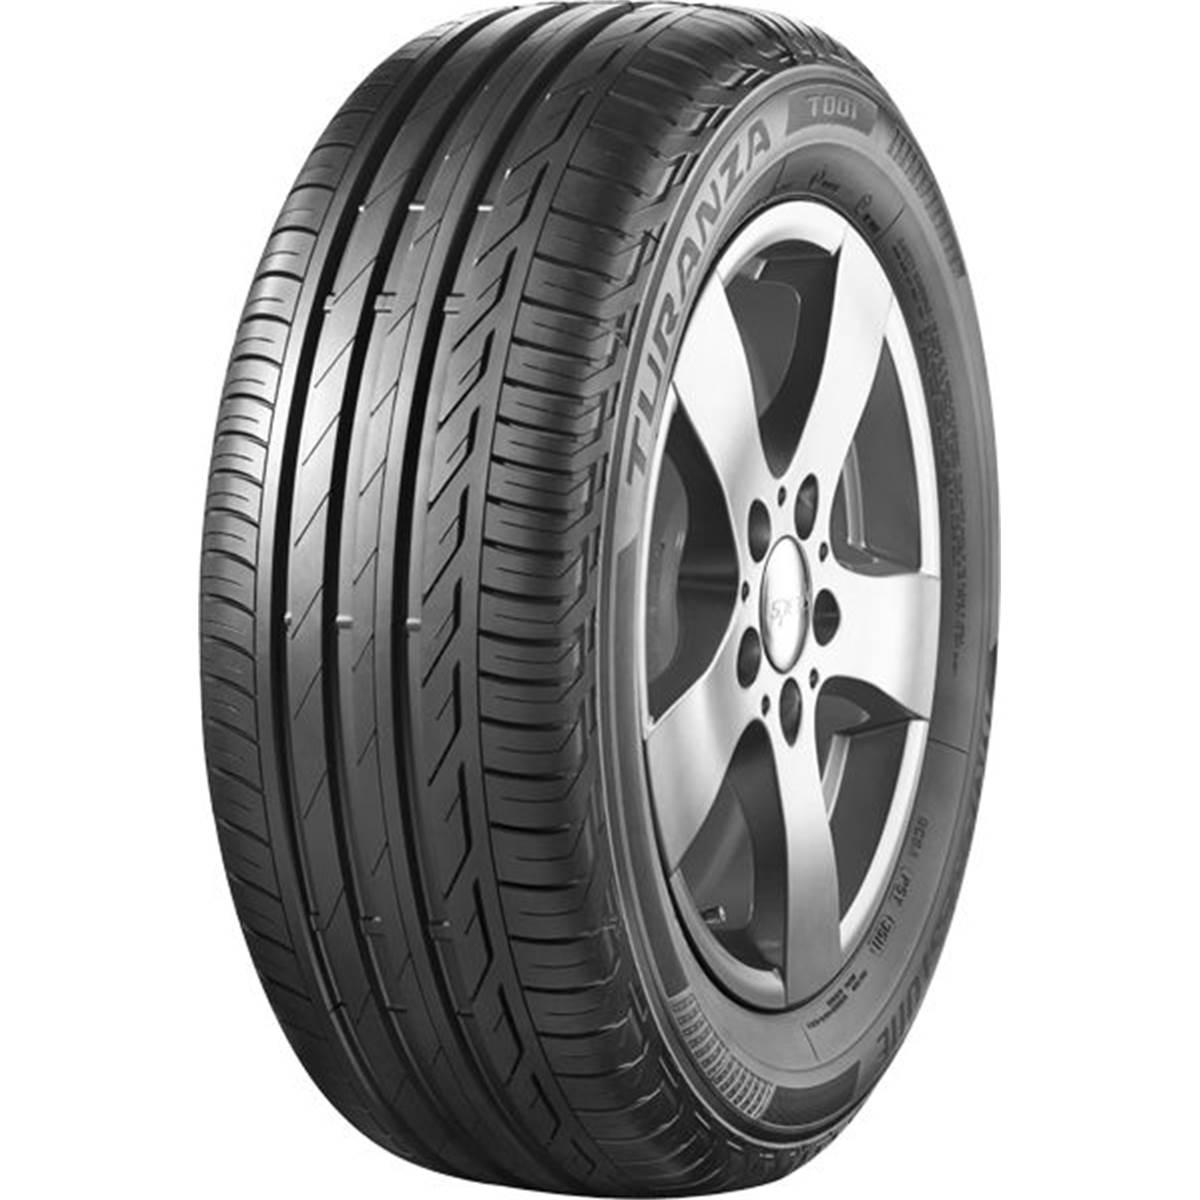 Pneu Bridgestone 185/50R16 81H Turanza T001